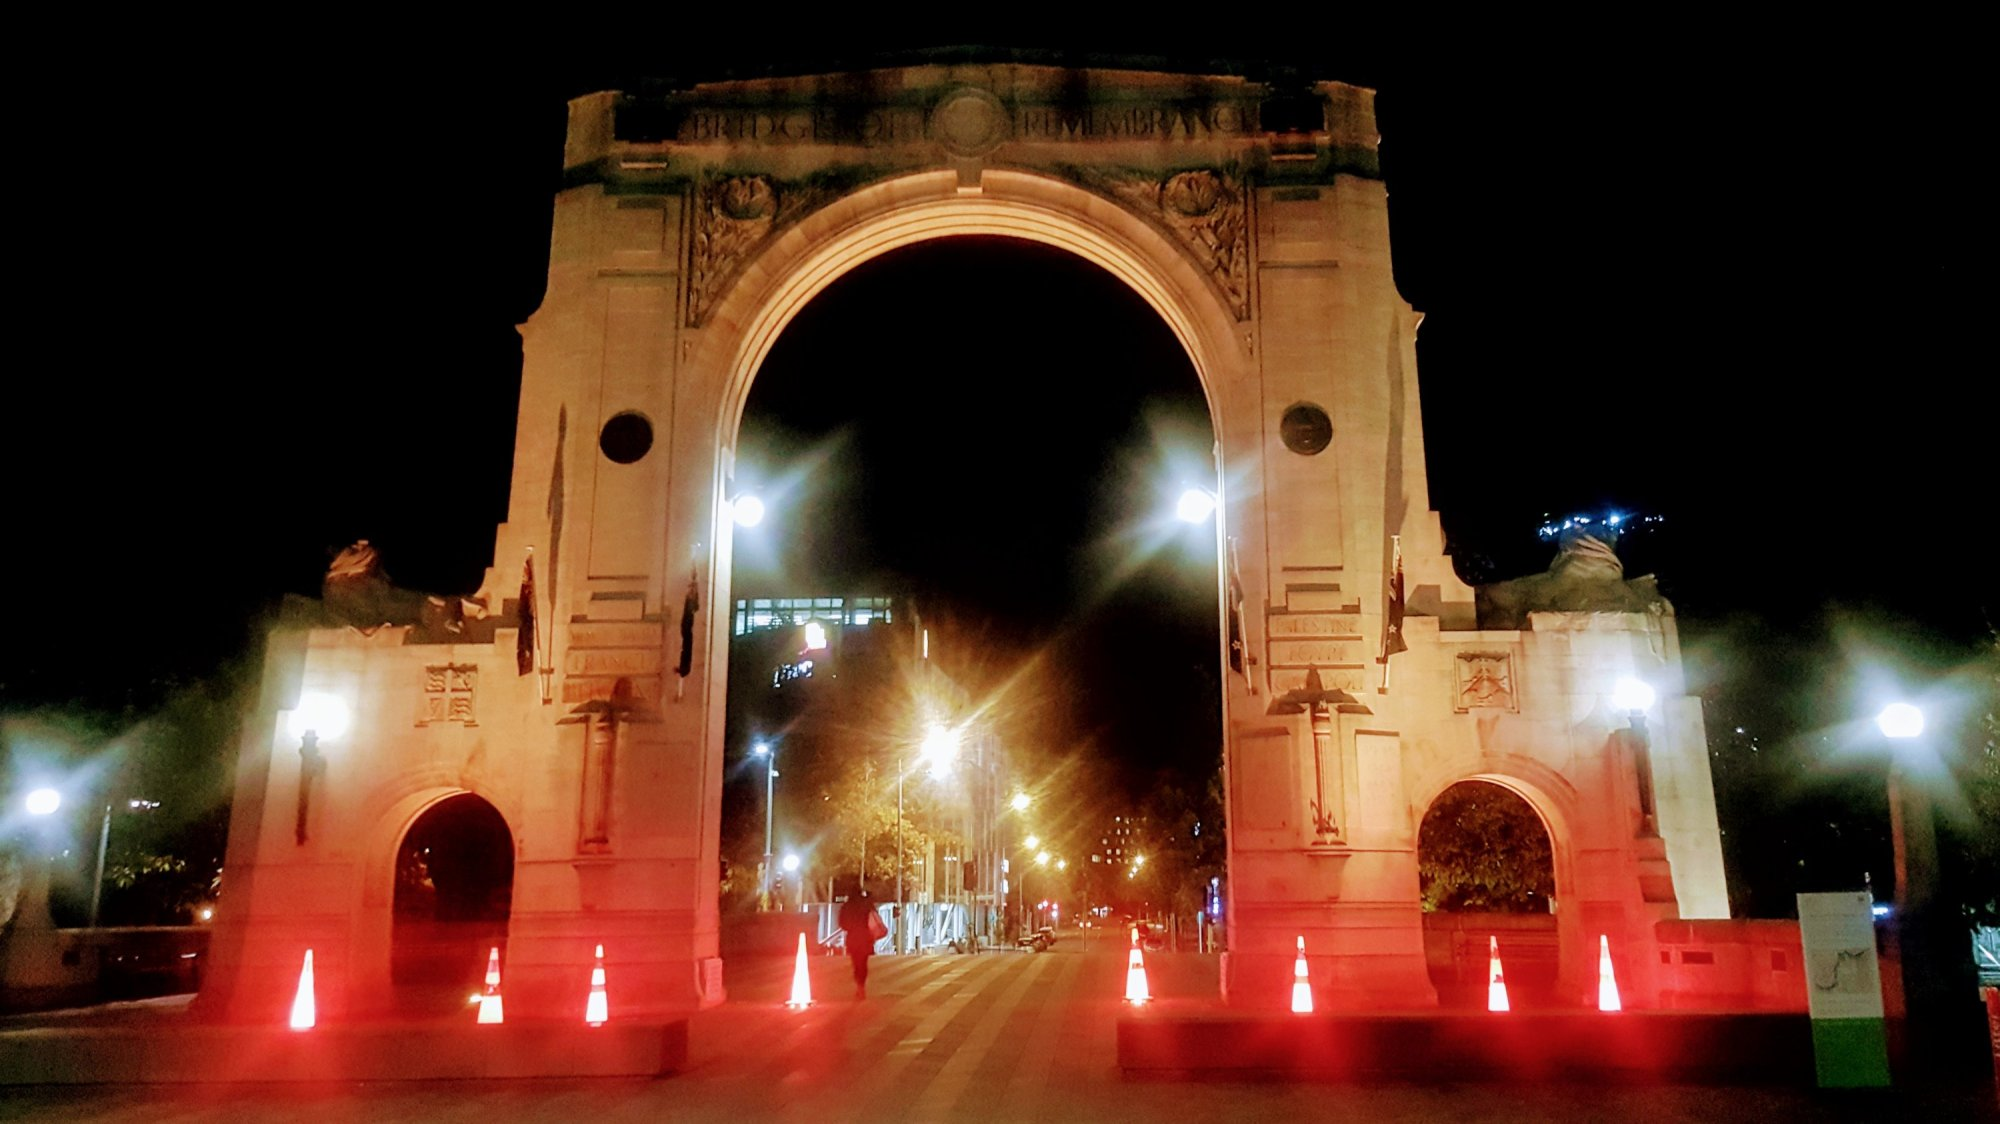 1-bridge-of-remembrance-christchurch-01